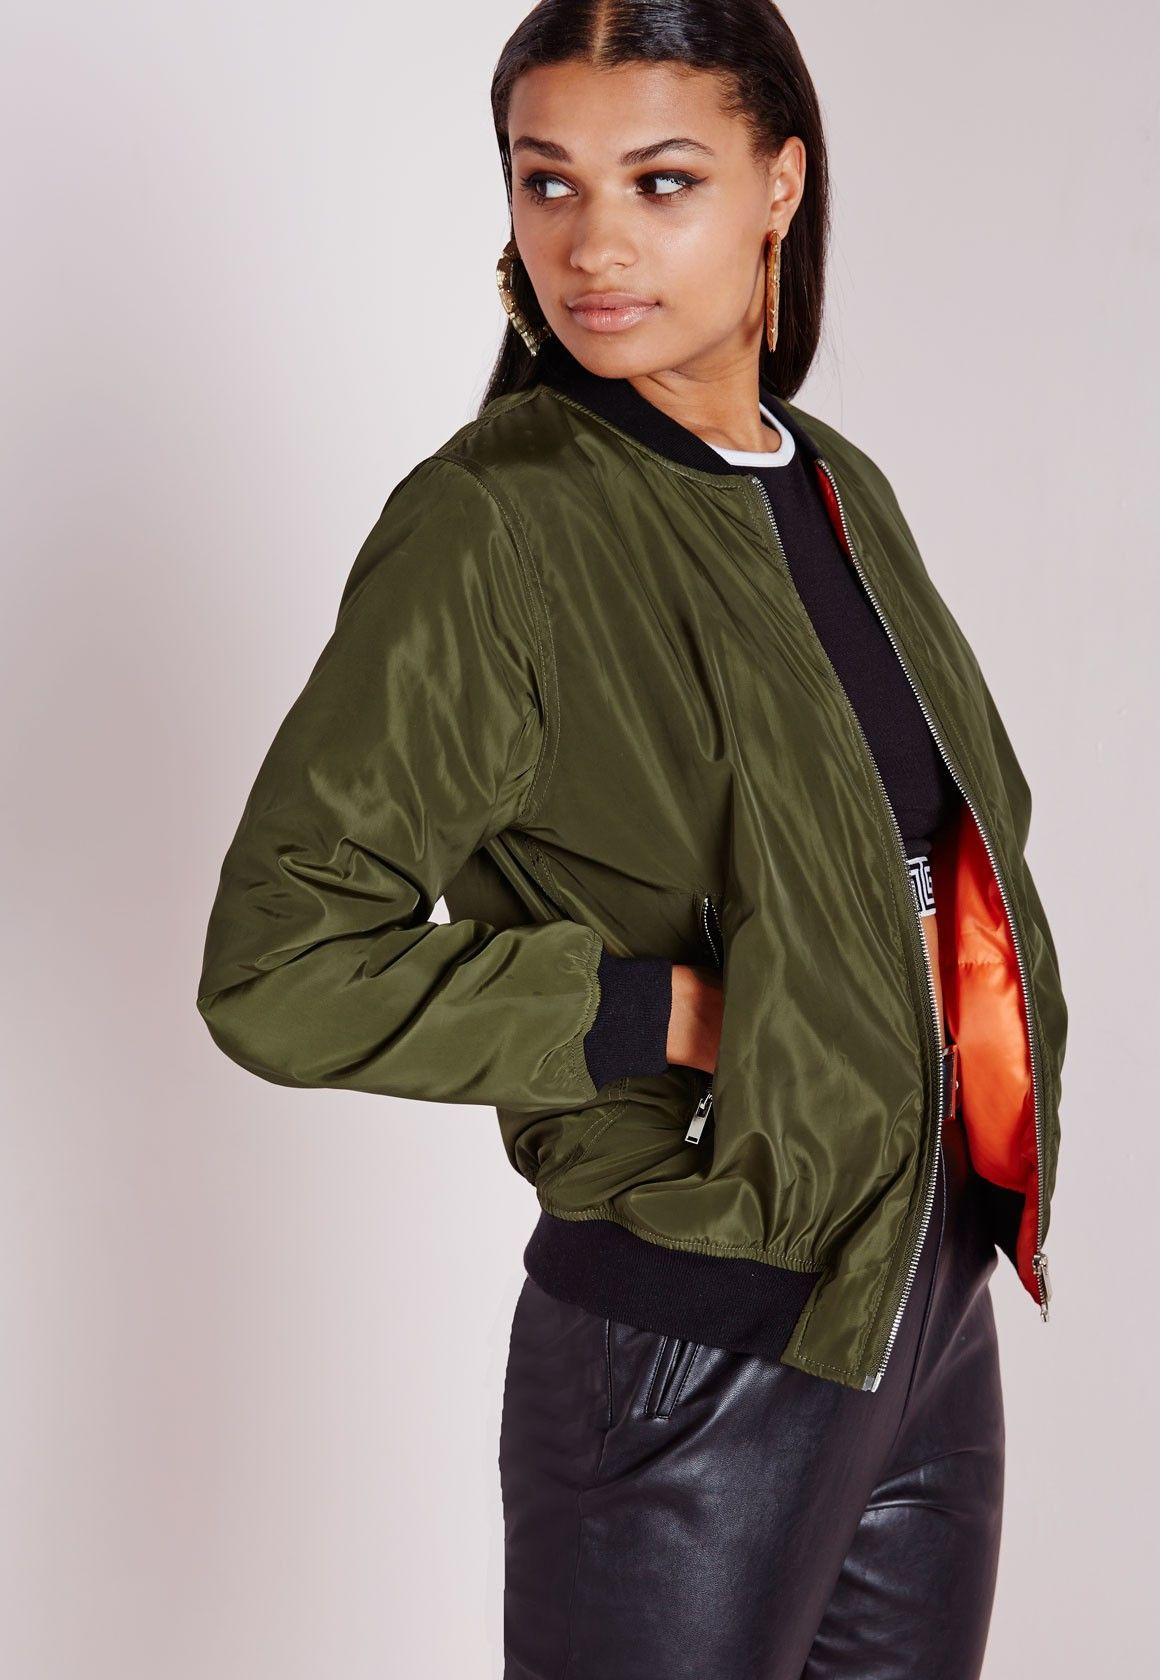 Missguided - Padded Bomber Jacket Khaki | Fallin' | Pinterest ...